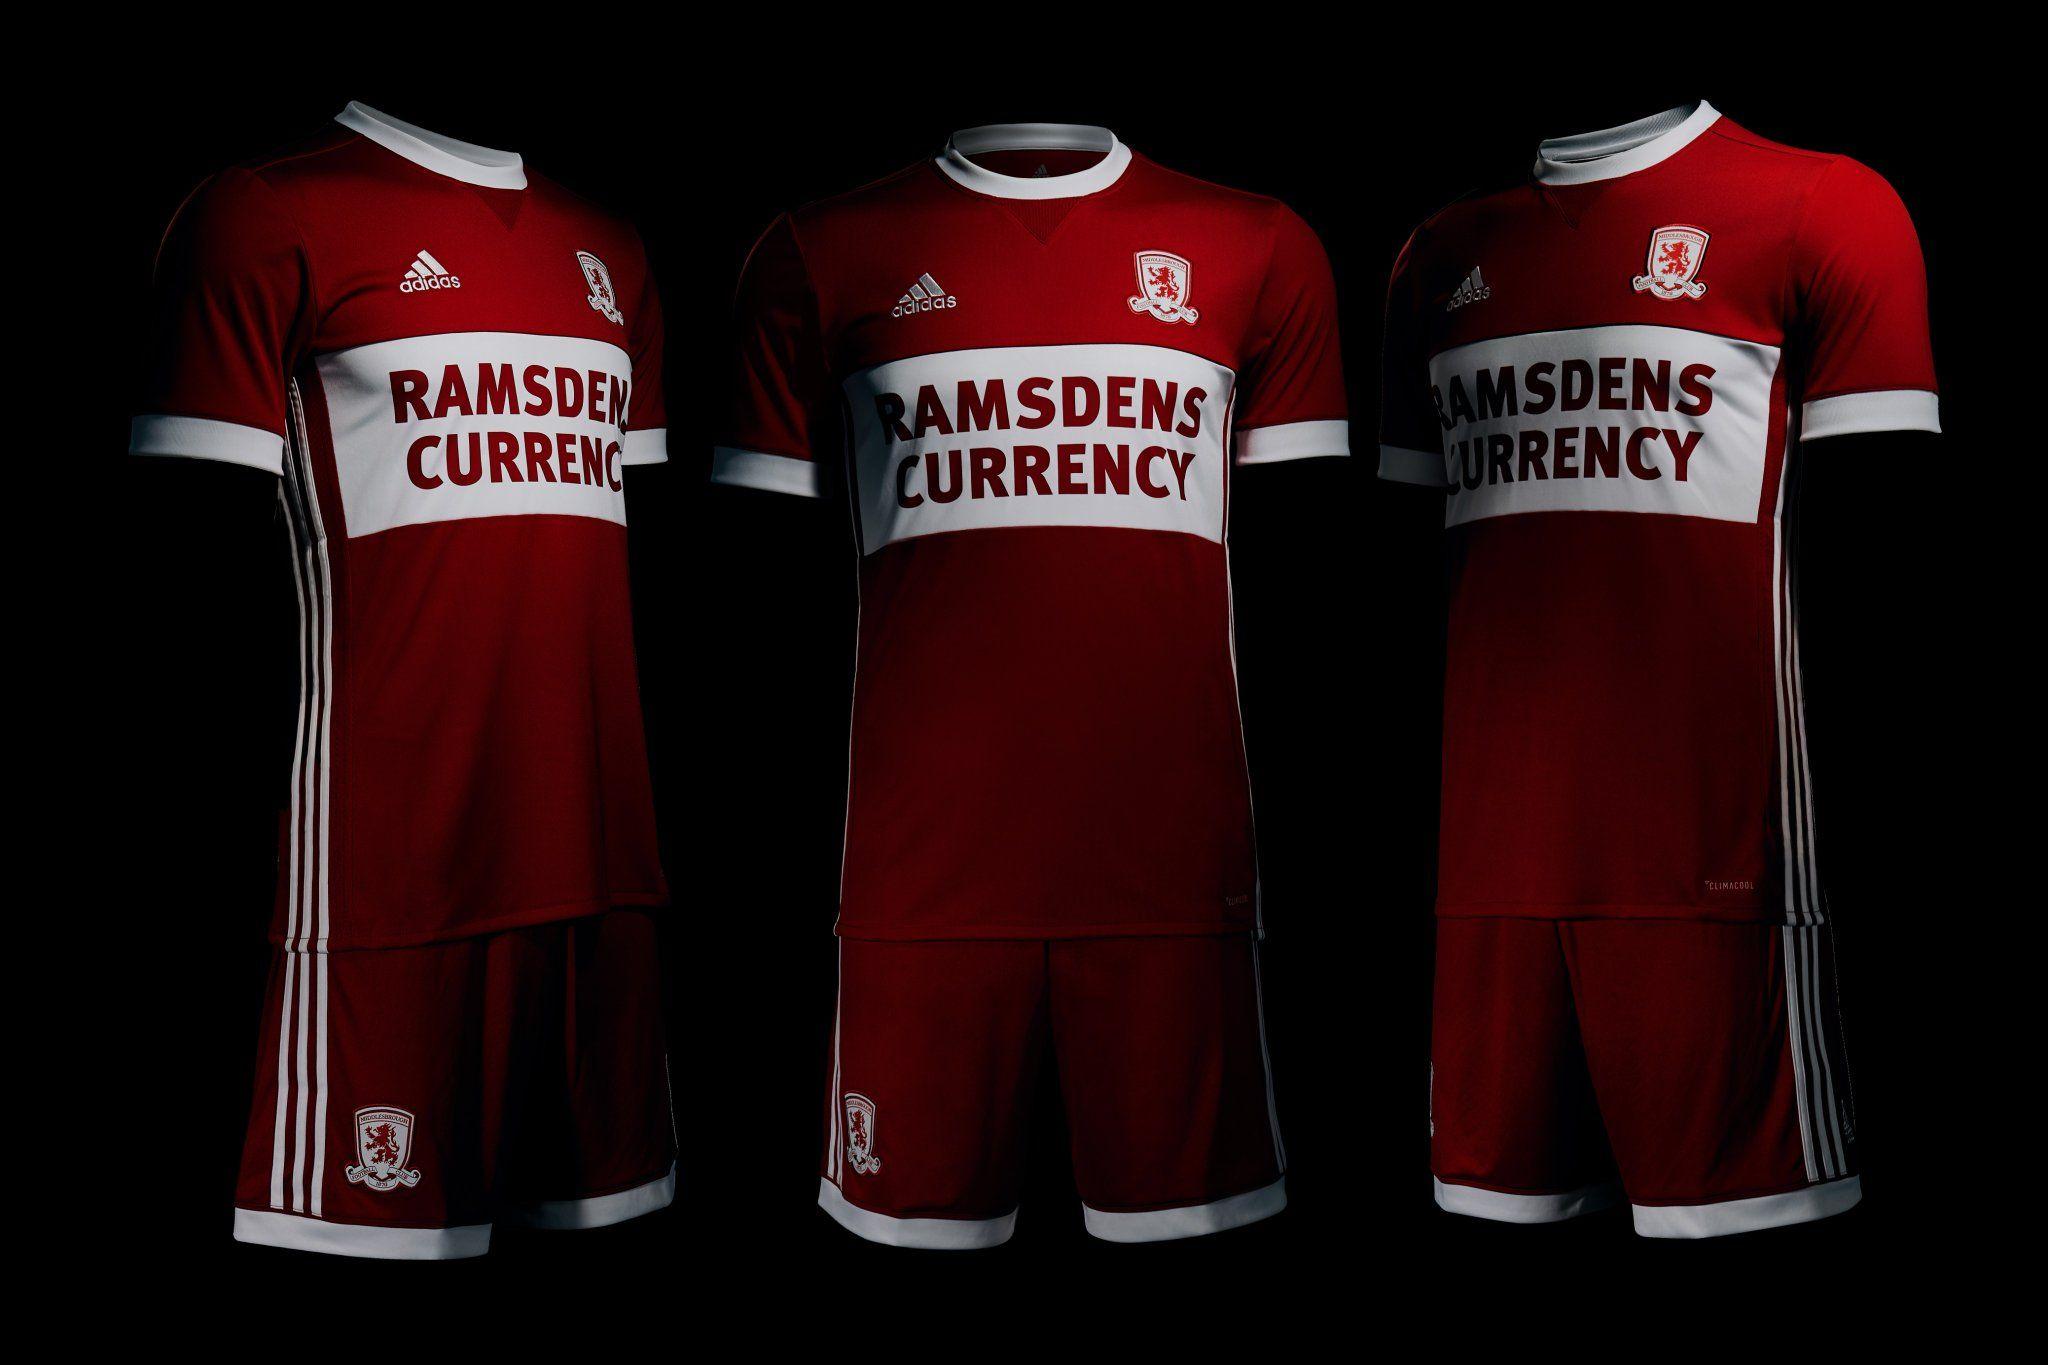 san francisco bce11 e8a78 Middlesbrough 2017-18 Adidas Home Kit  1718 Kits  Football shirt blog